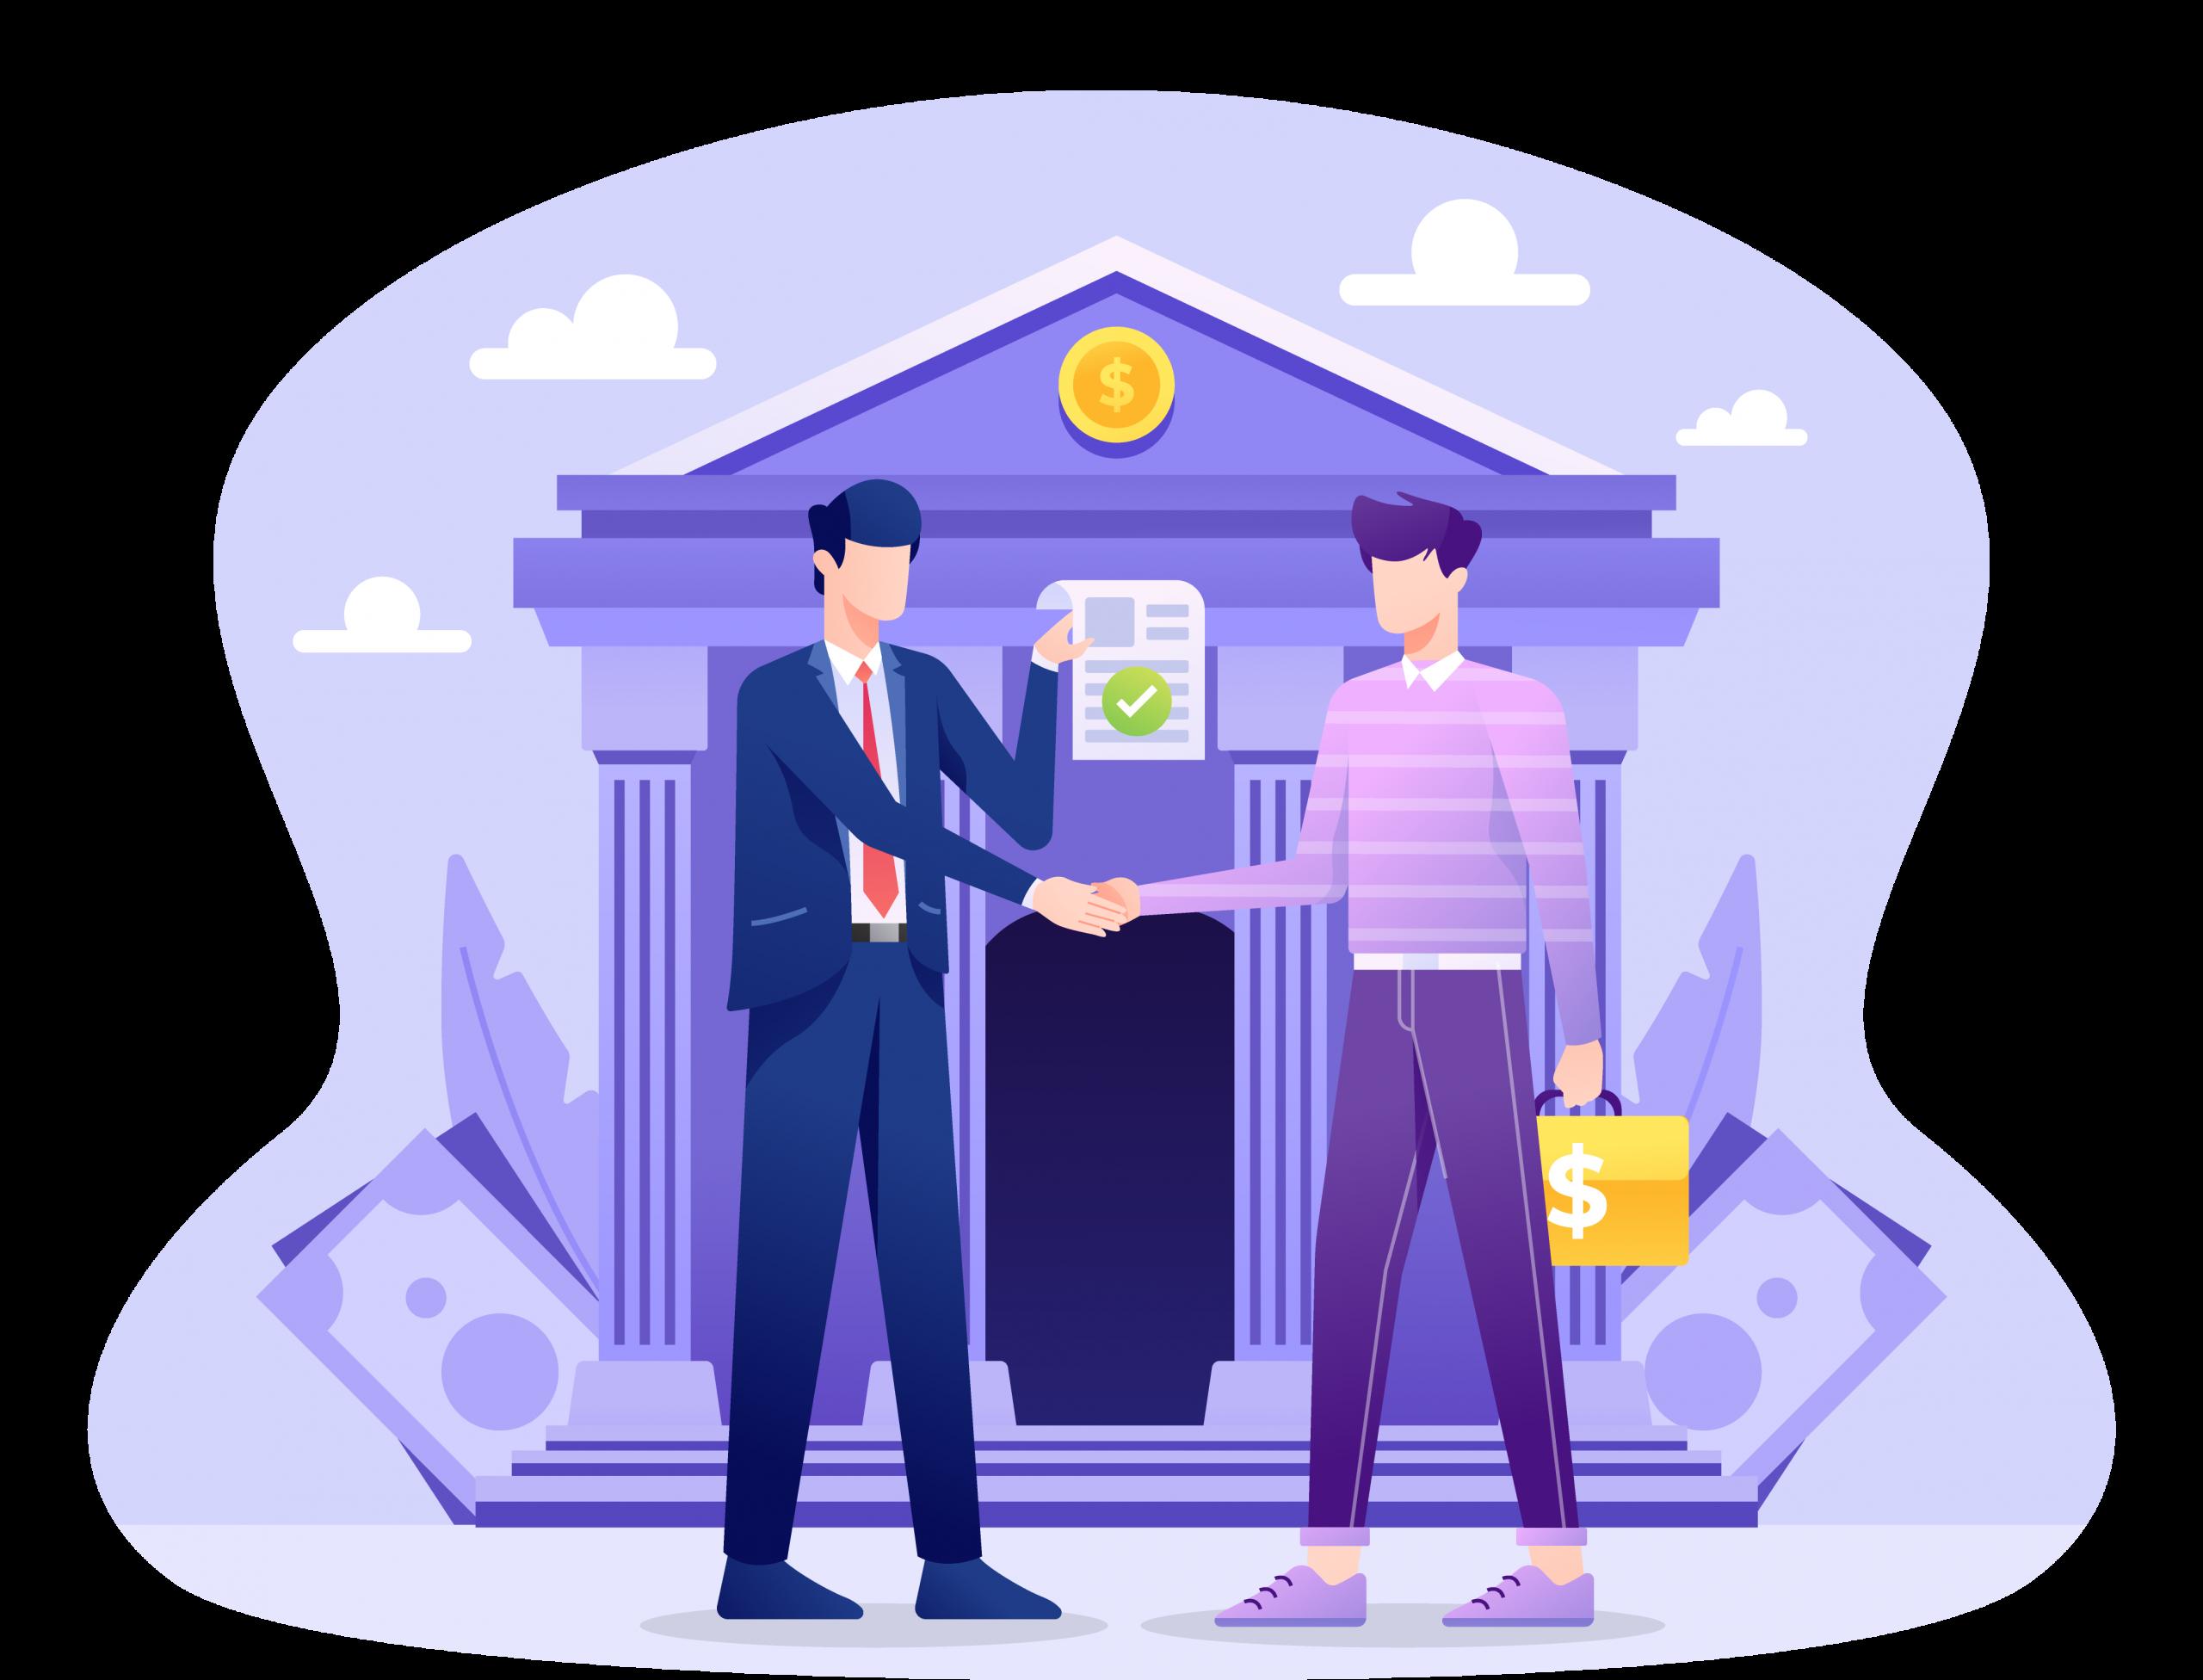 App & Software Financing Plans